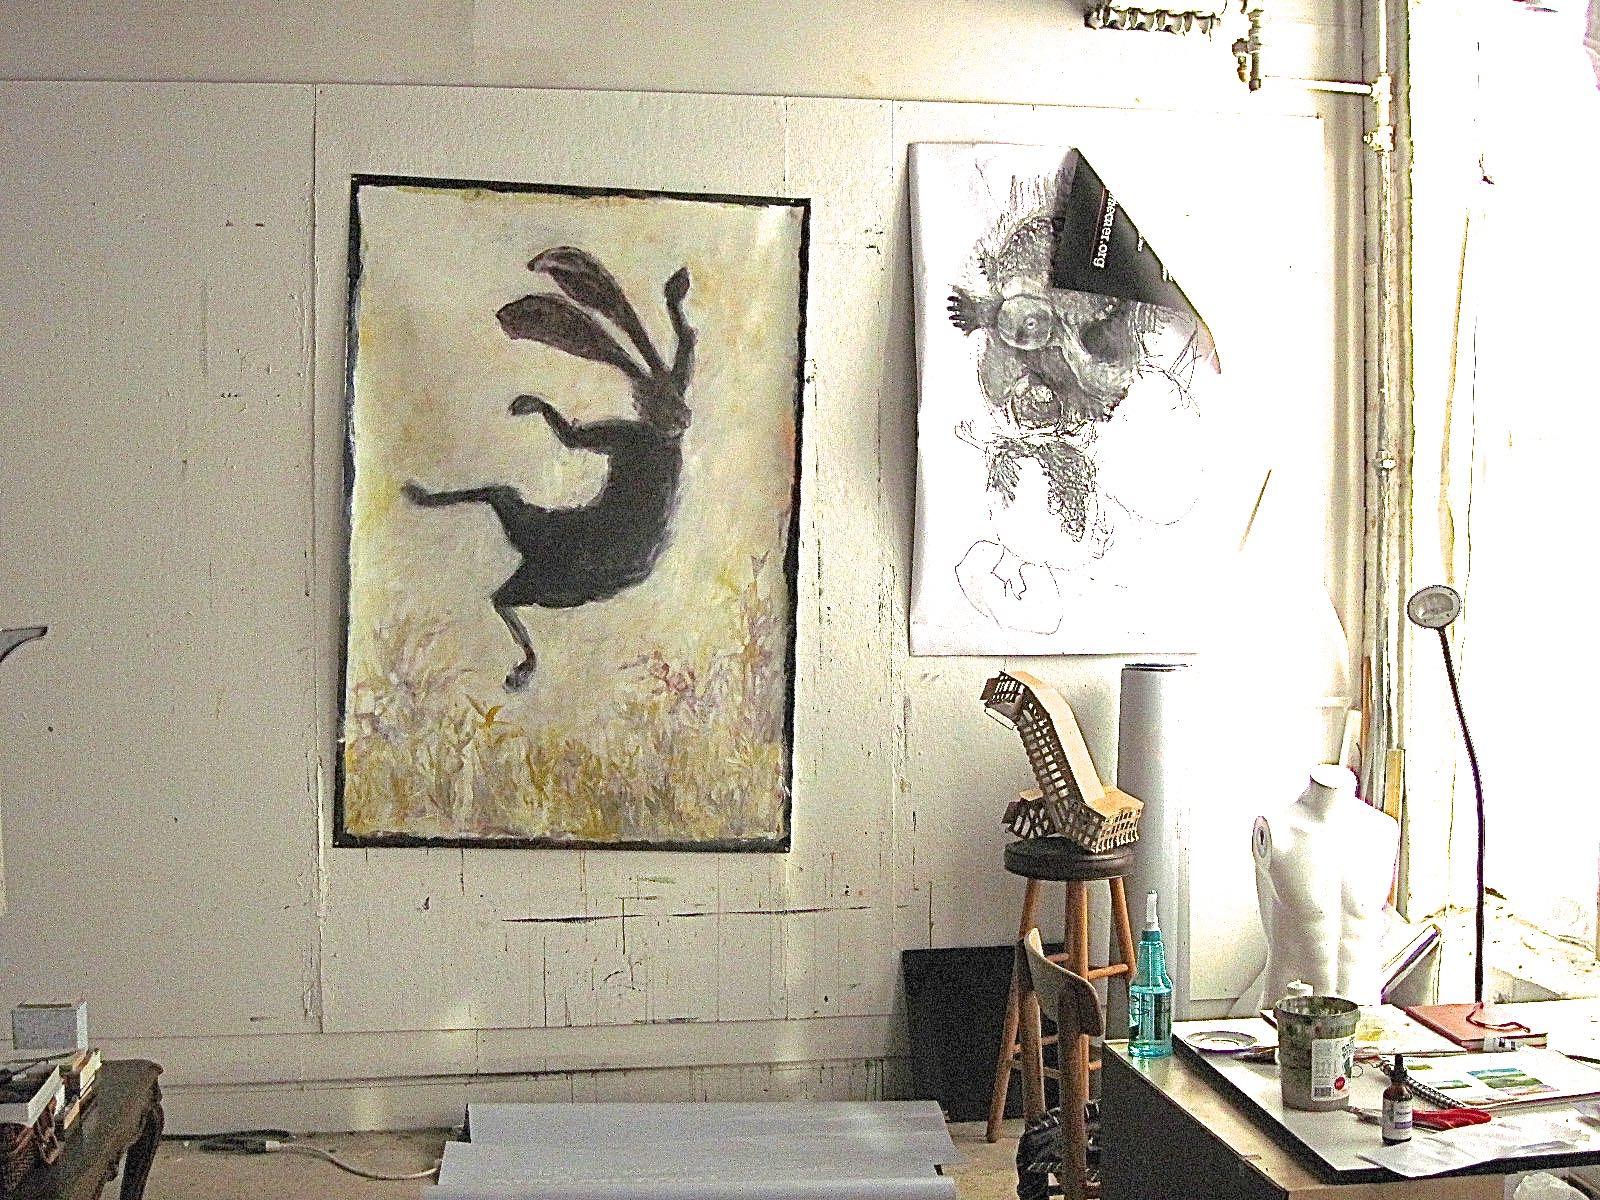 Sarah Leon, Studio, Waltham Open Studios, 2021